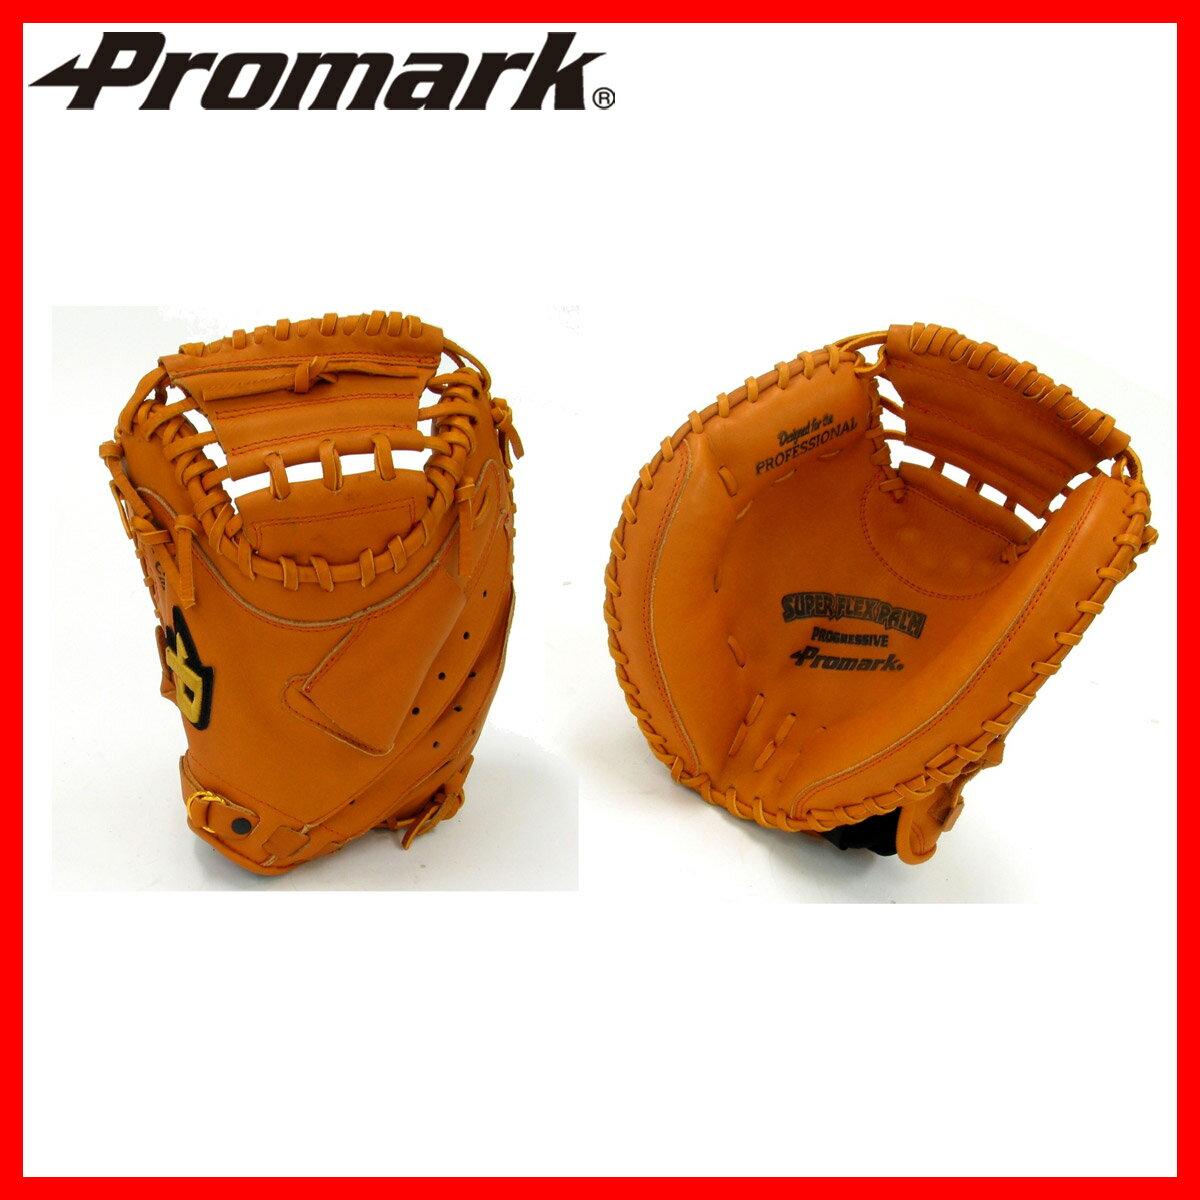 【PROMARK・プロマーク】 野球グローブ PCM-4363RH 野球グラブ 軟式野球 promark プロマーク 左投げ用 一般 軟式キャッチャーミット 1005_flash 02P03Dec16